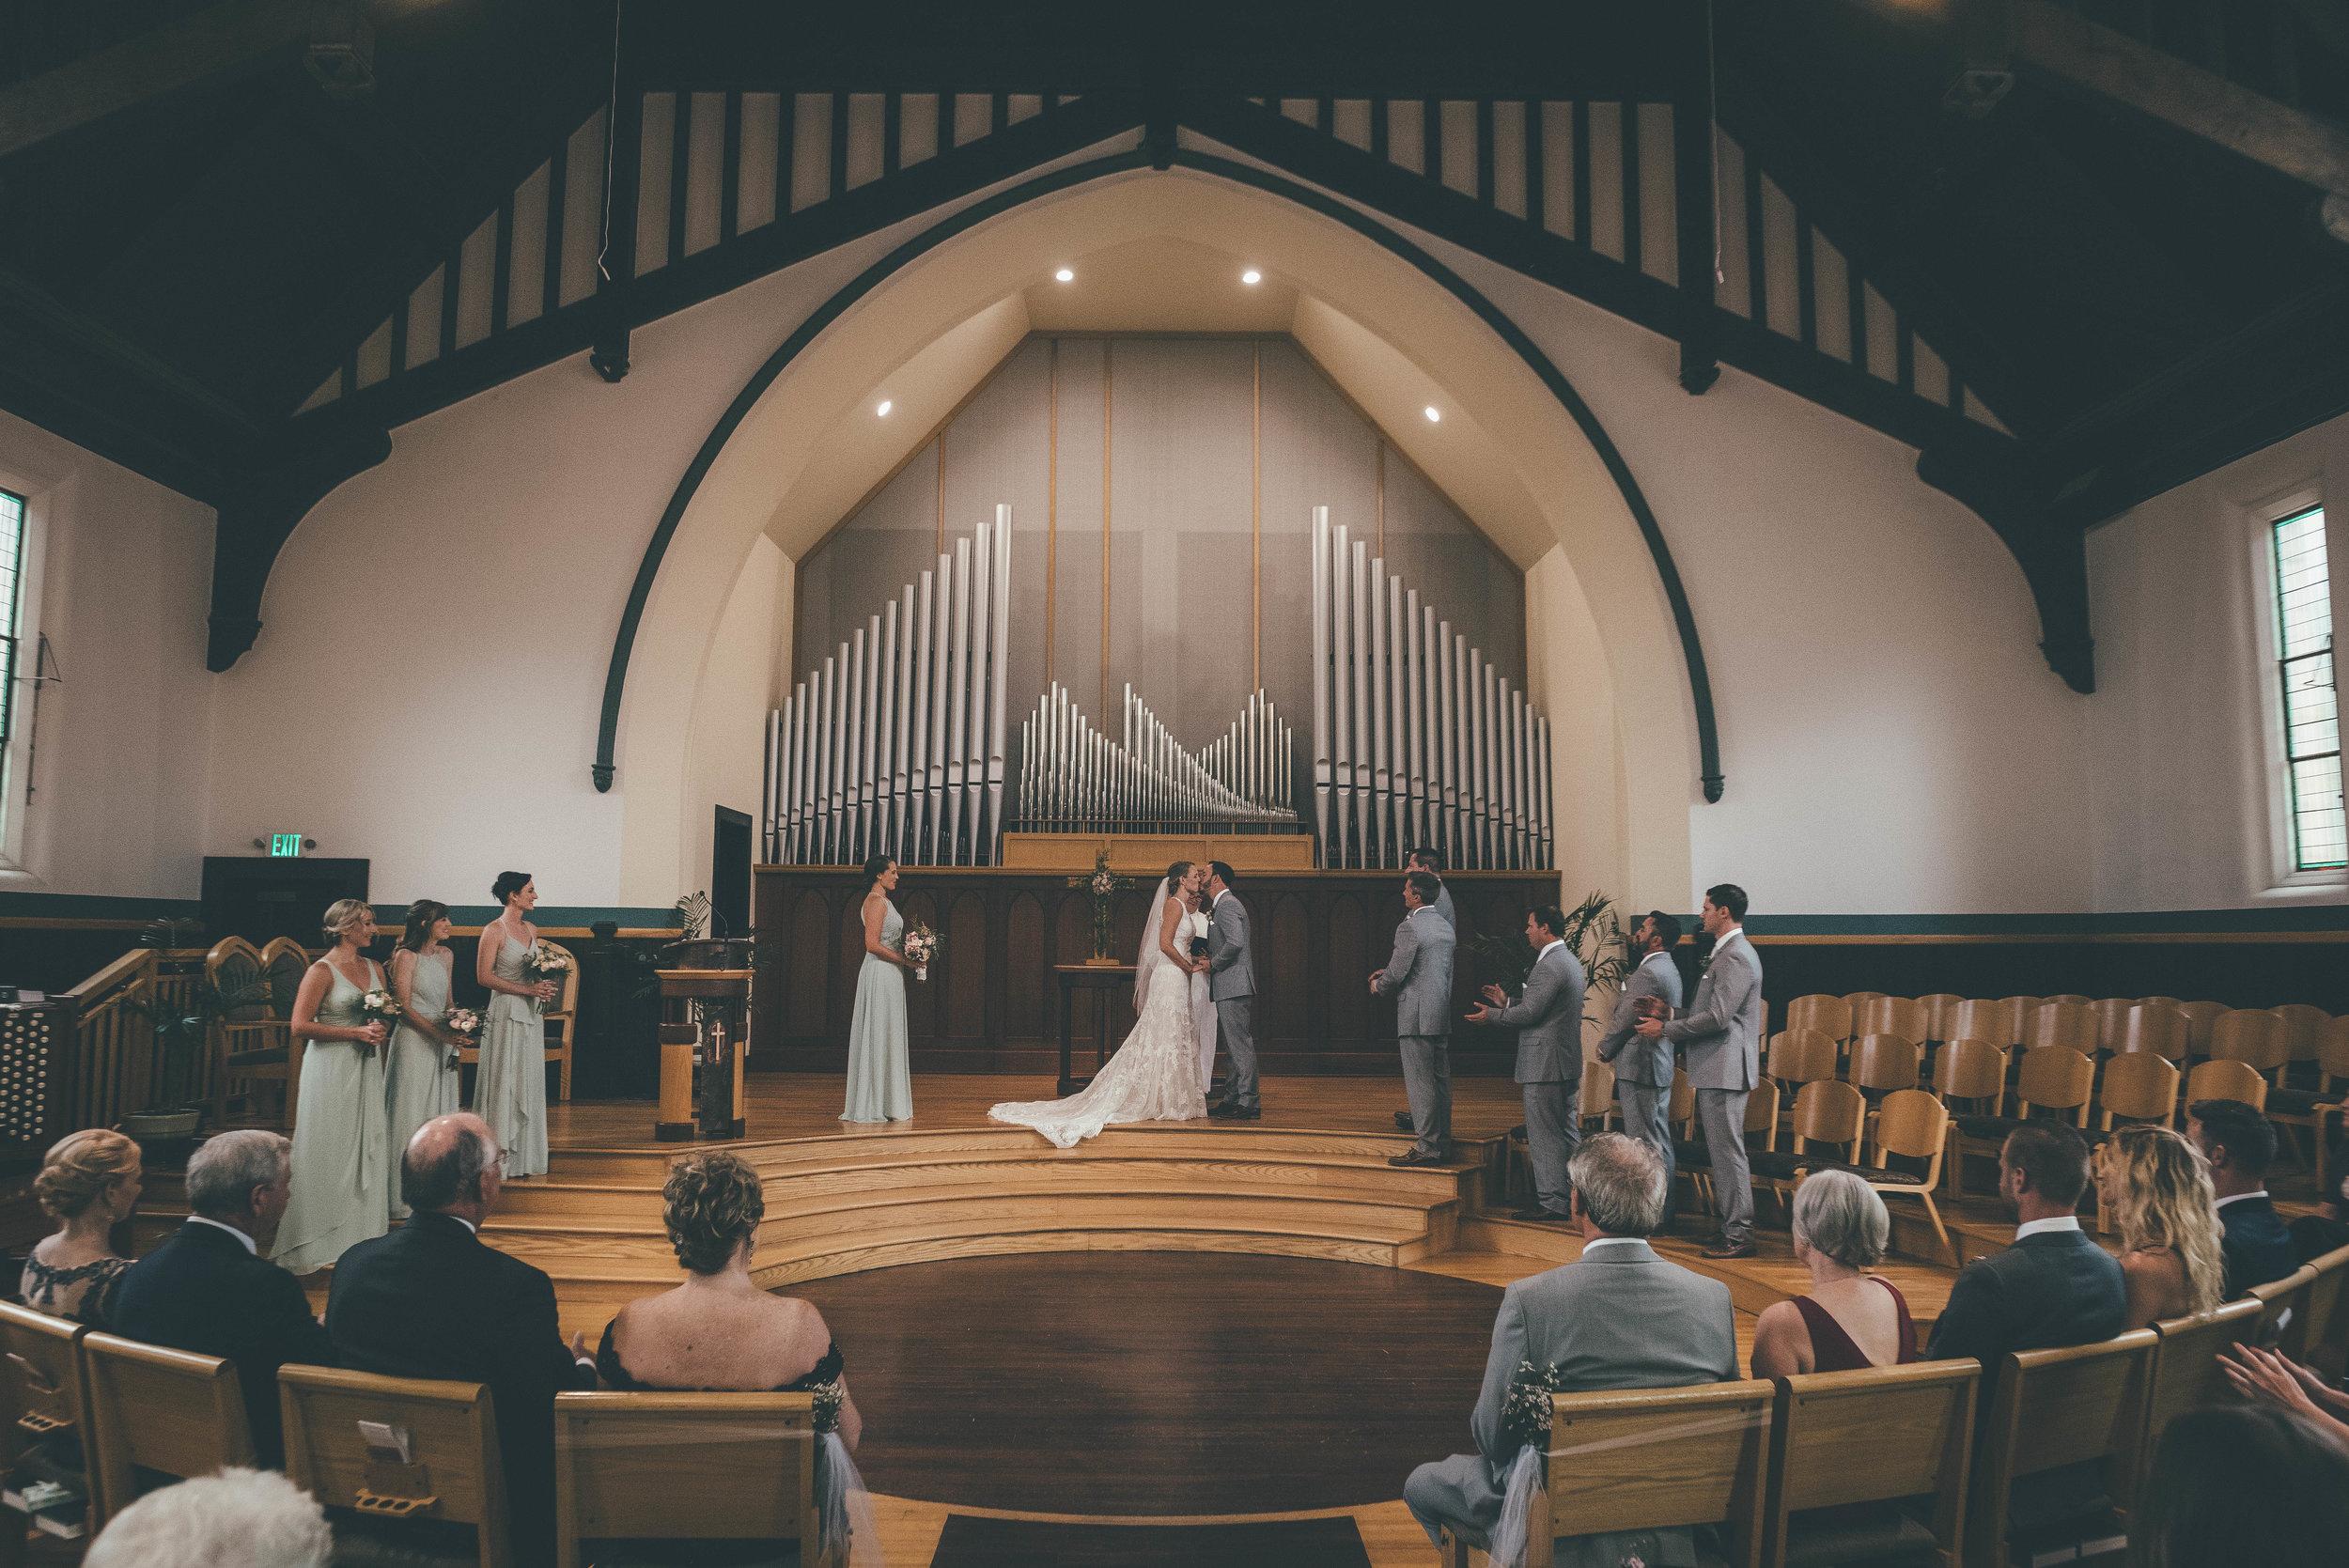 ChadFahnestockPhotography-mc-wedding-014.jpg